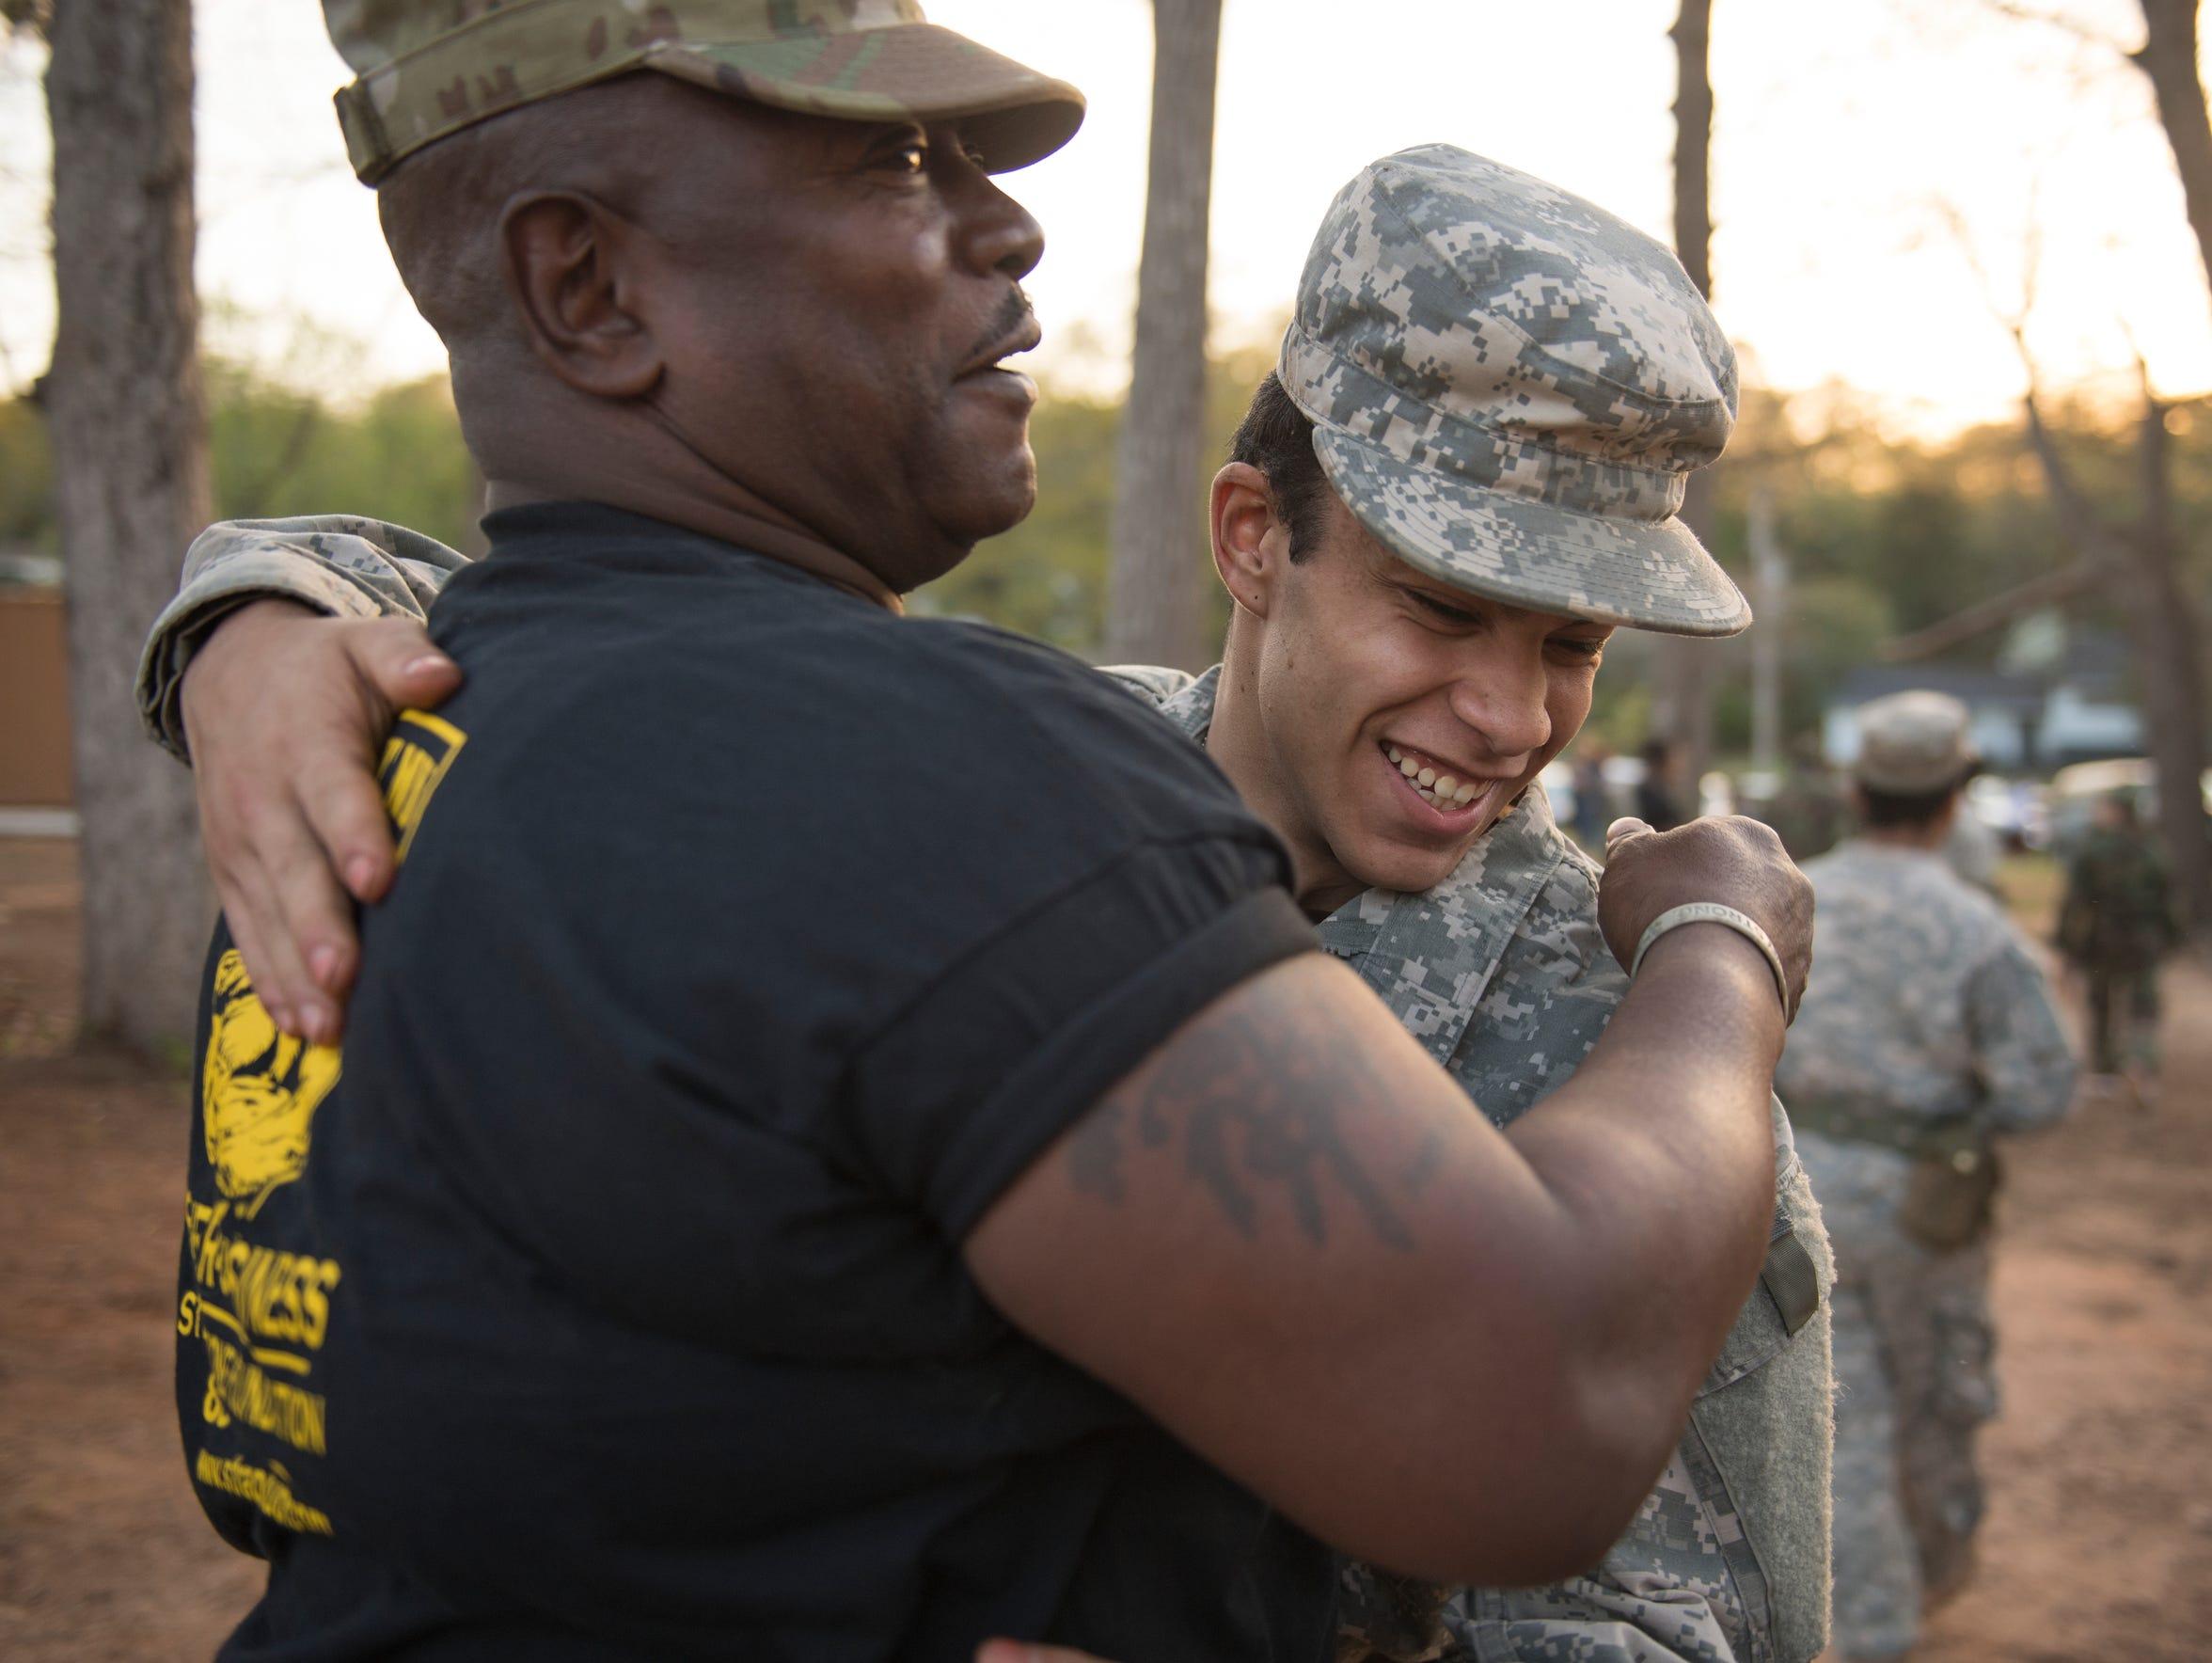 Jose Lopez, 15, hugs Drill Sergeant Steven Sullivan